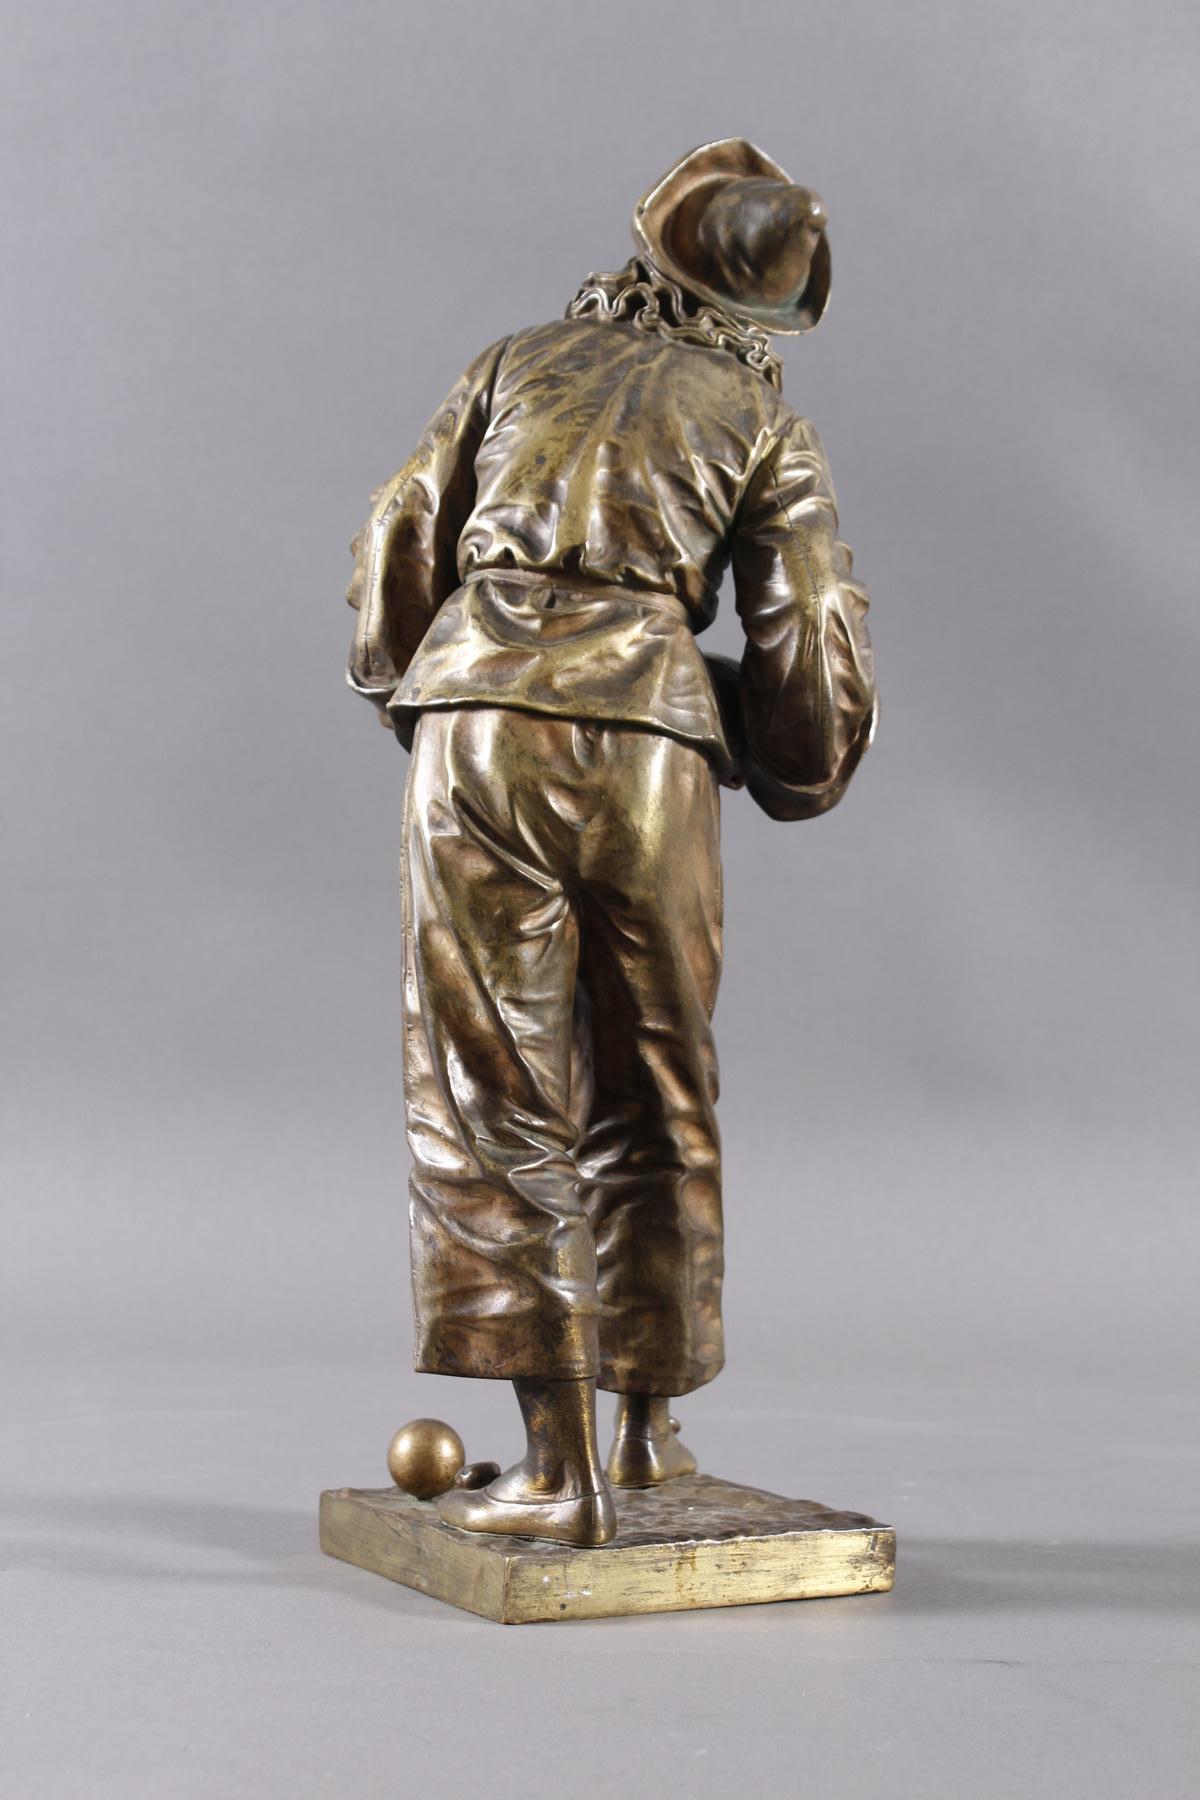 Eutrope Bouret (1833-1906), Bronzeskulptur 'Au claire de la Lune' um 1890/1900-4